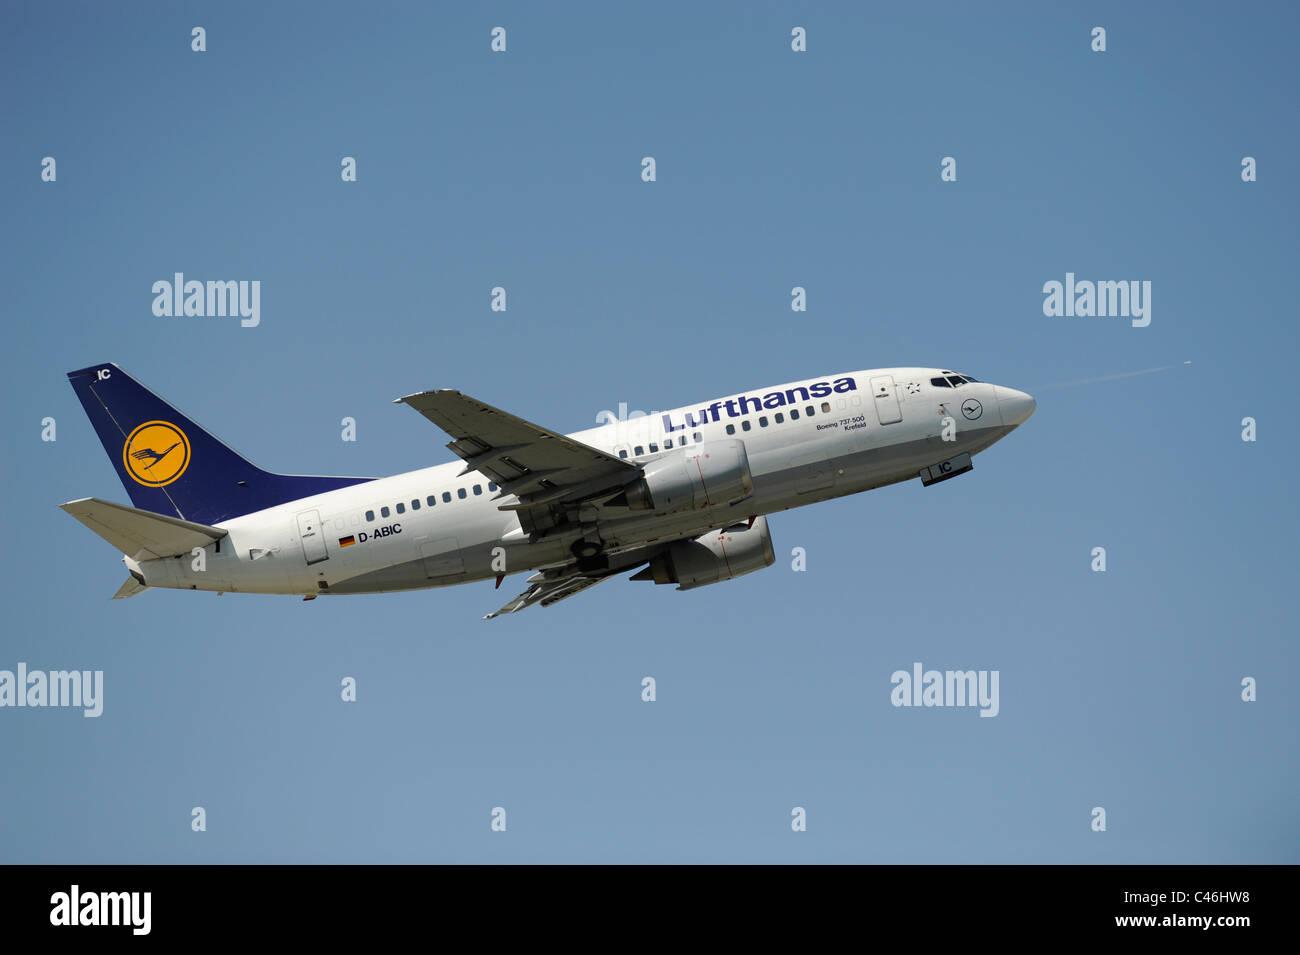 airplane Boeing 737-500 of german airline Lufthansa at take